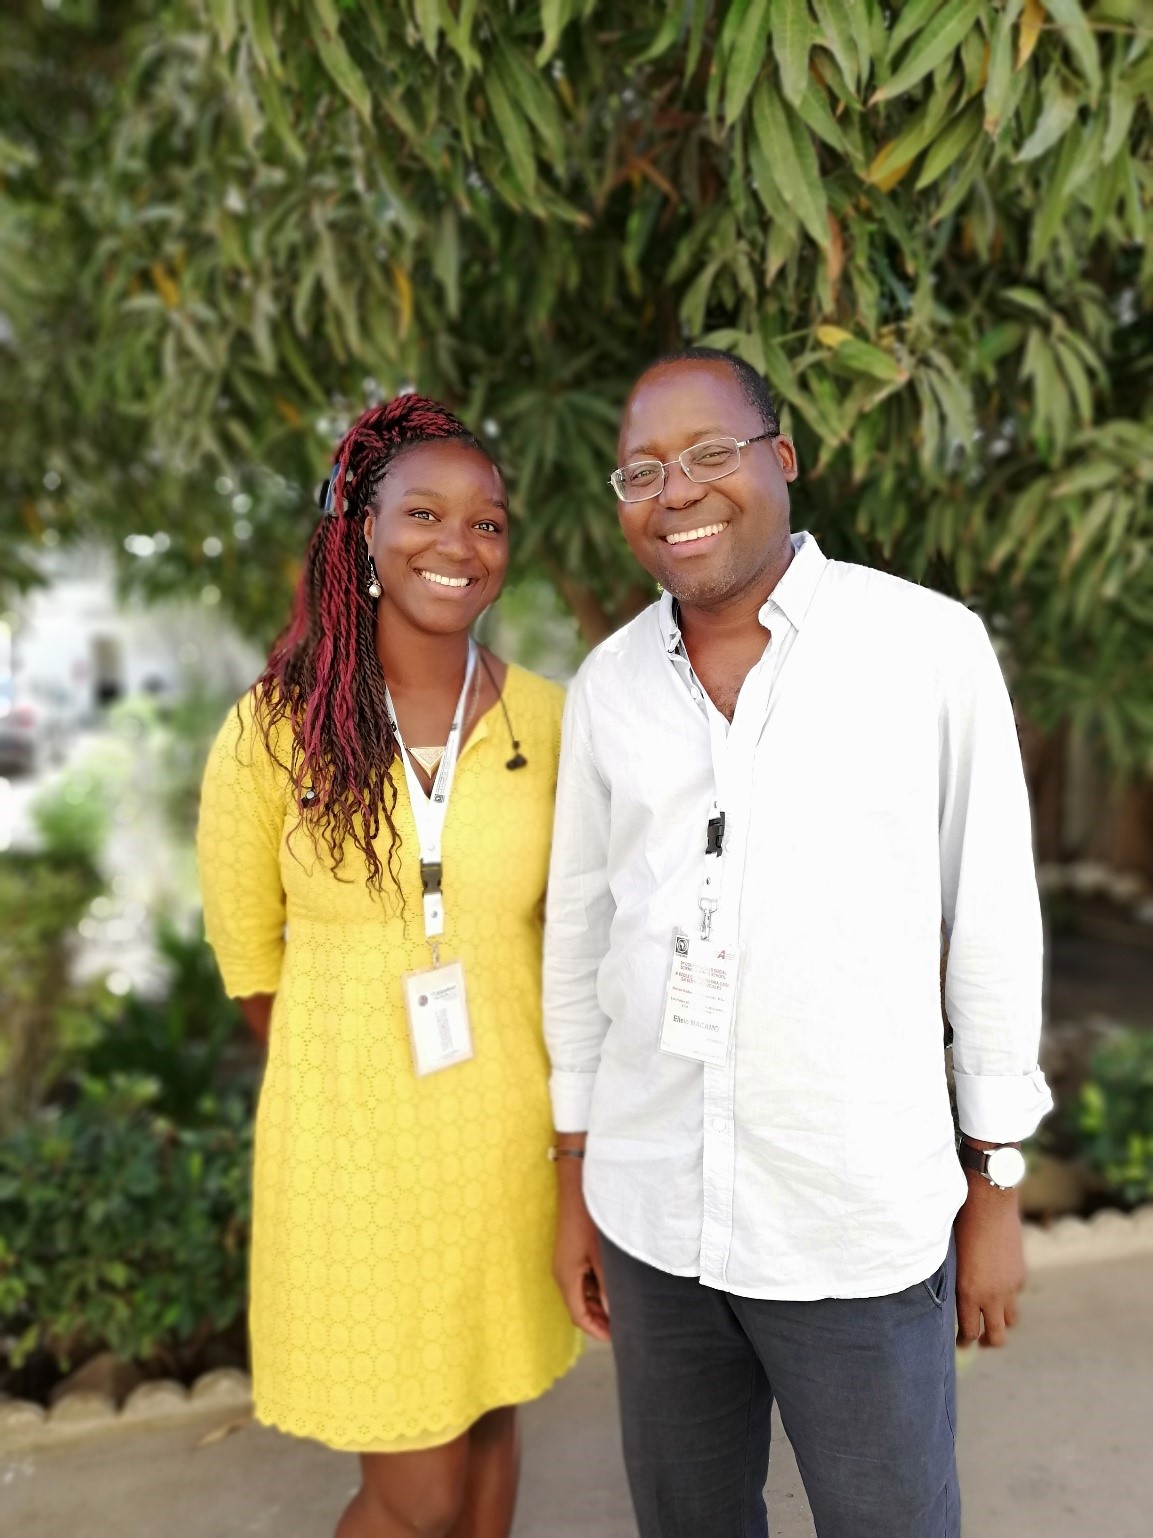 Alex Nadège Ouedraogo with Prof. Dr. Elísio Macamo (Summer School Director), Professor of African Studies at the University of Basel (Switzerland)Summer School 1.jpg (295 KB)